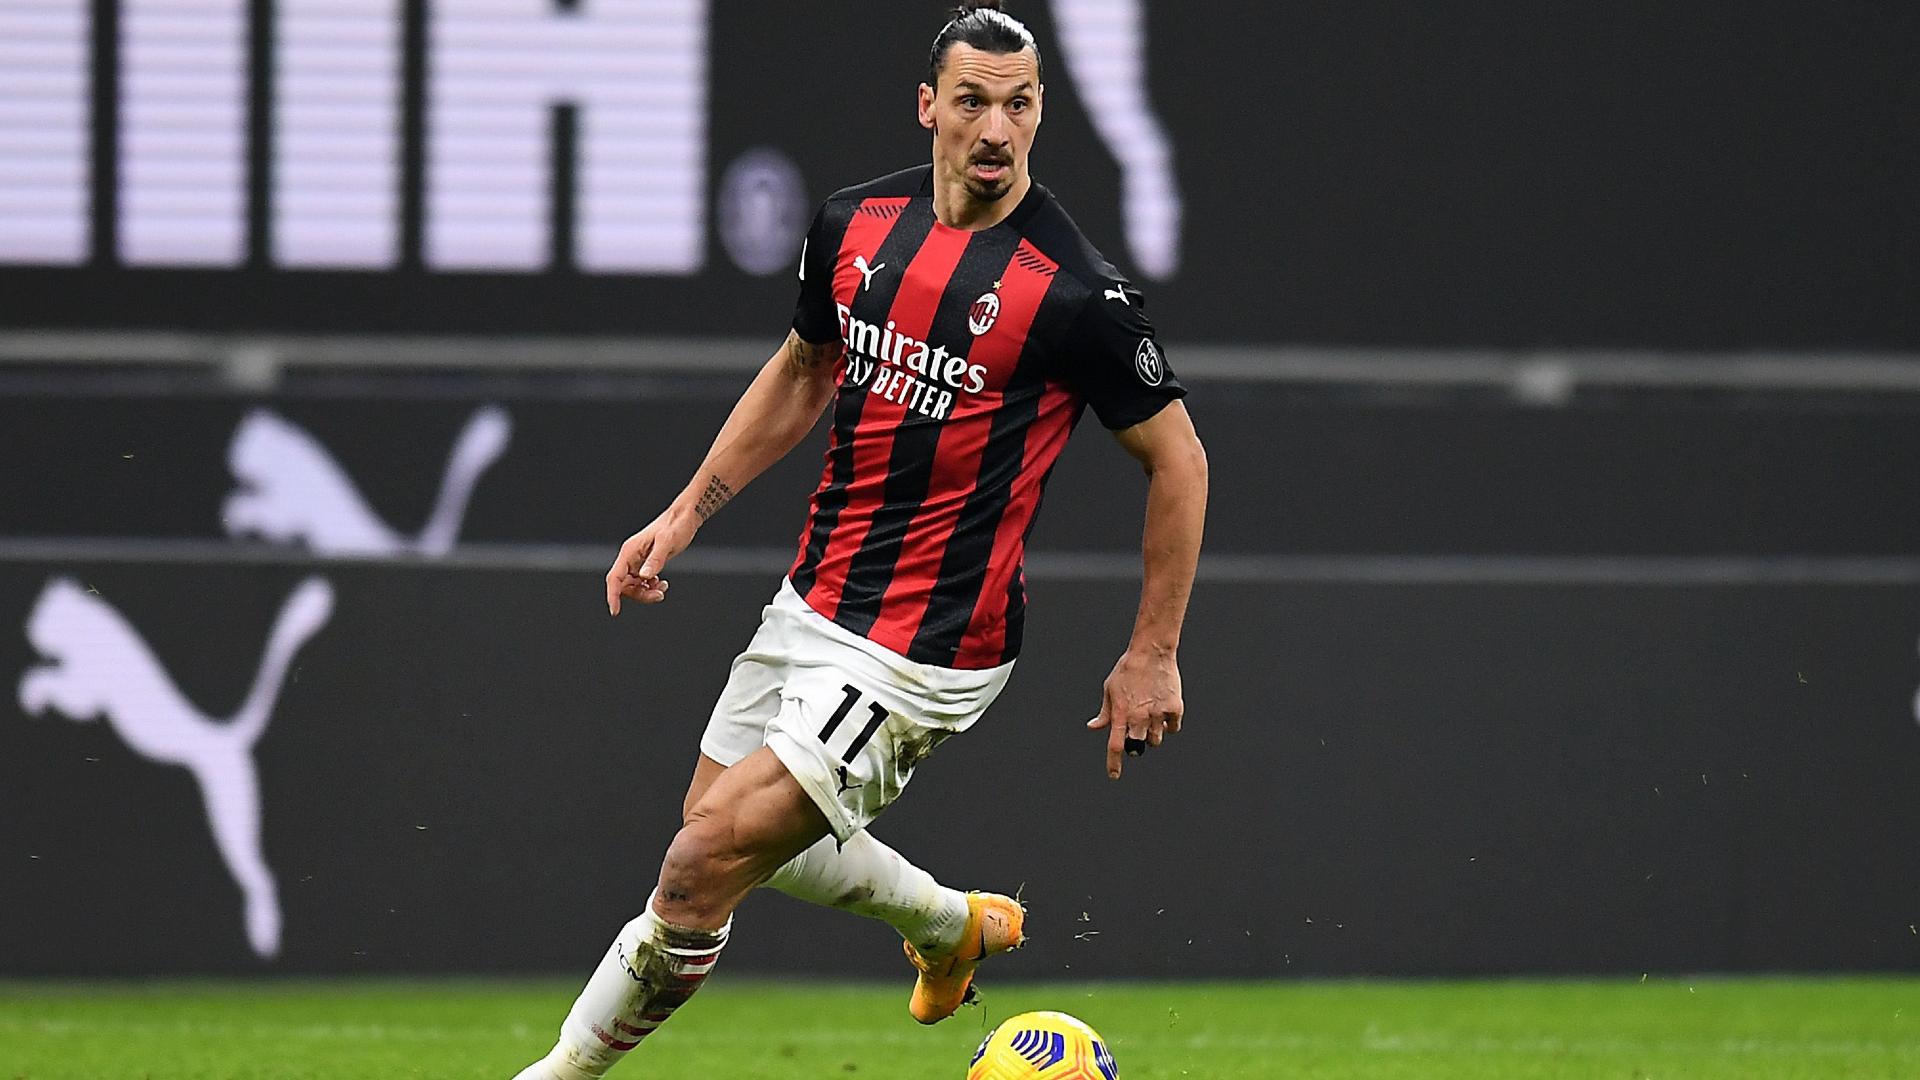 Pioli glad to see Ibrahimovic get more minutes as Milan scrape into Coppa Italia quarter-finals